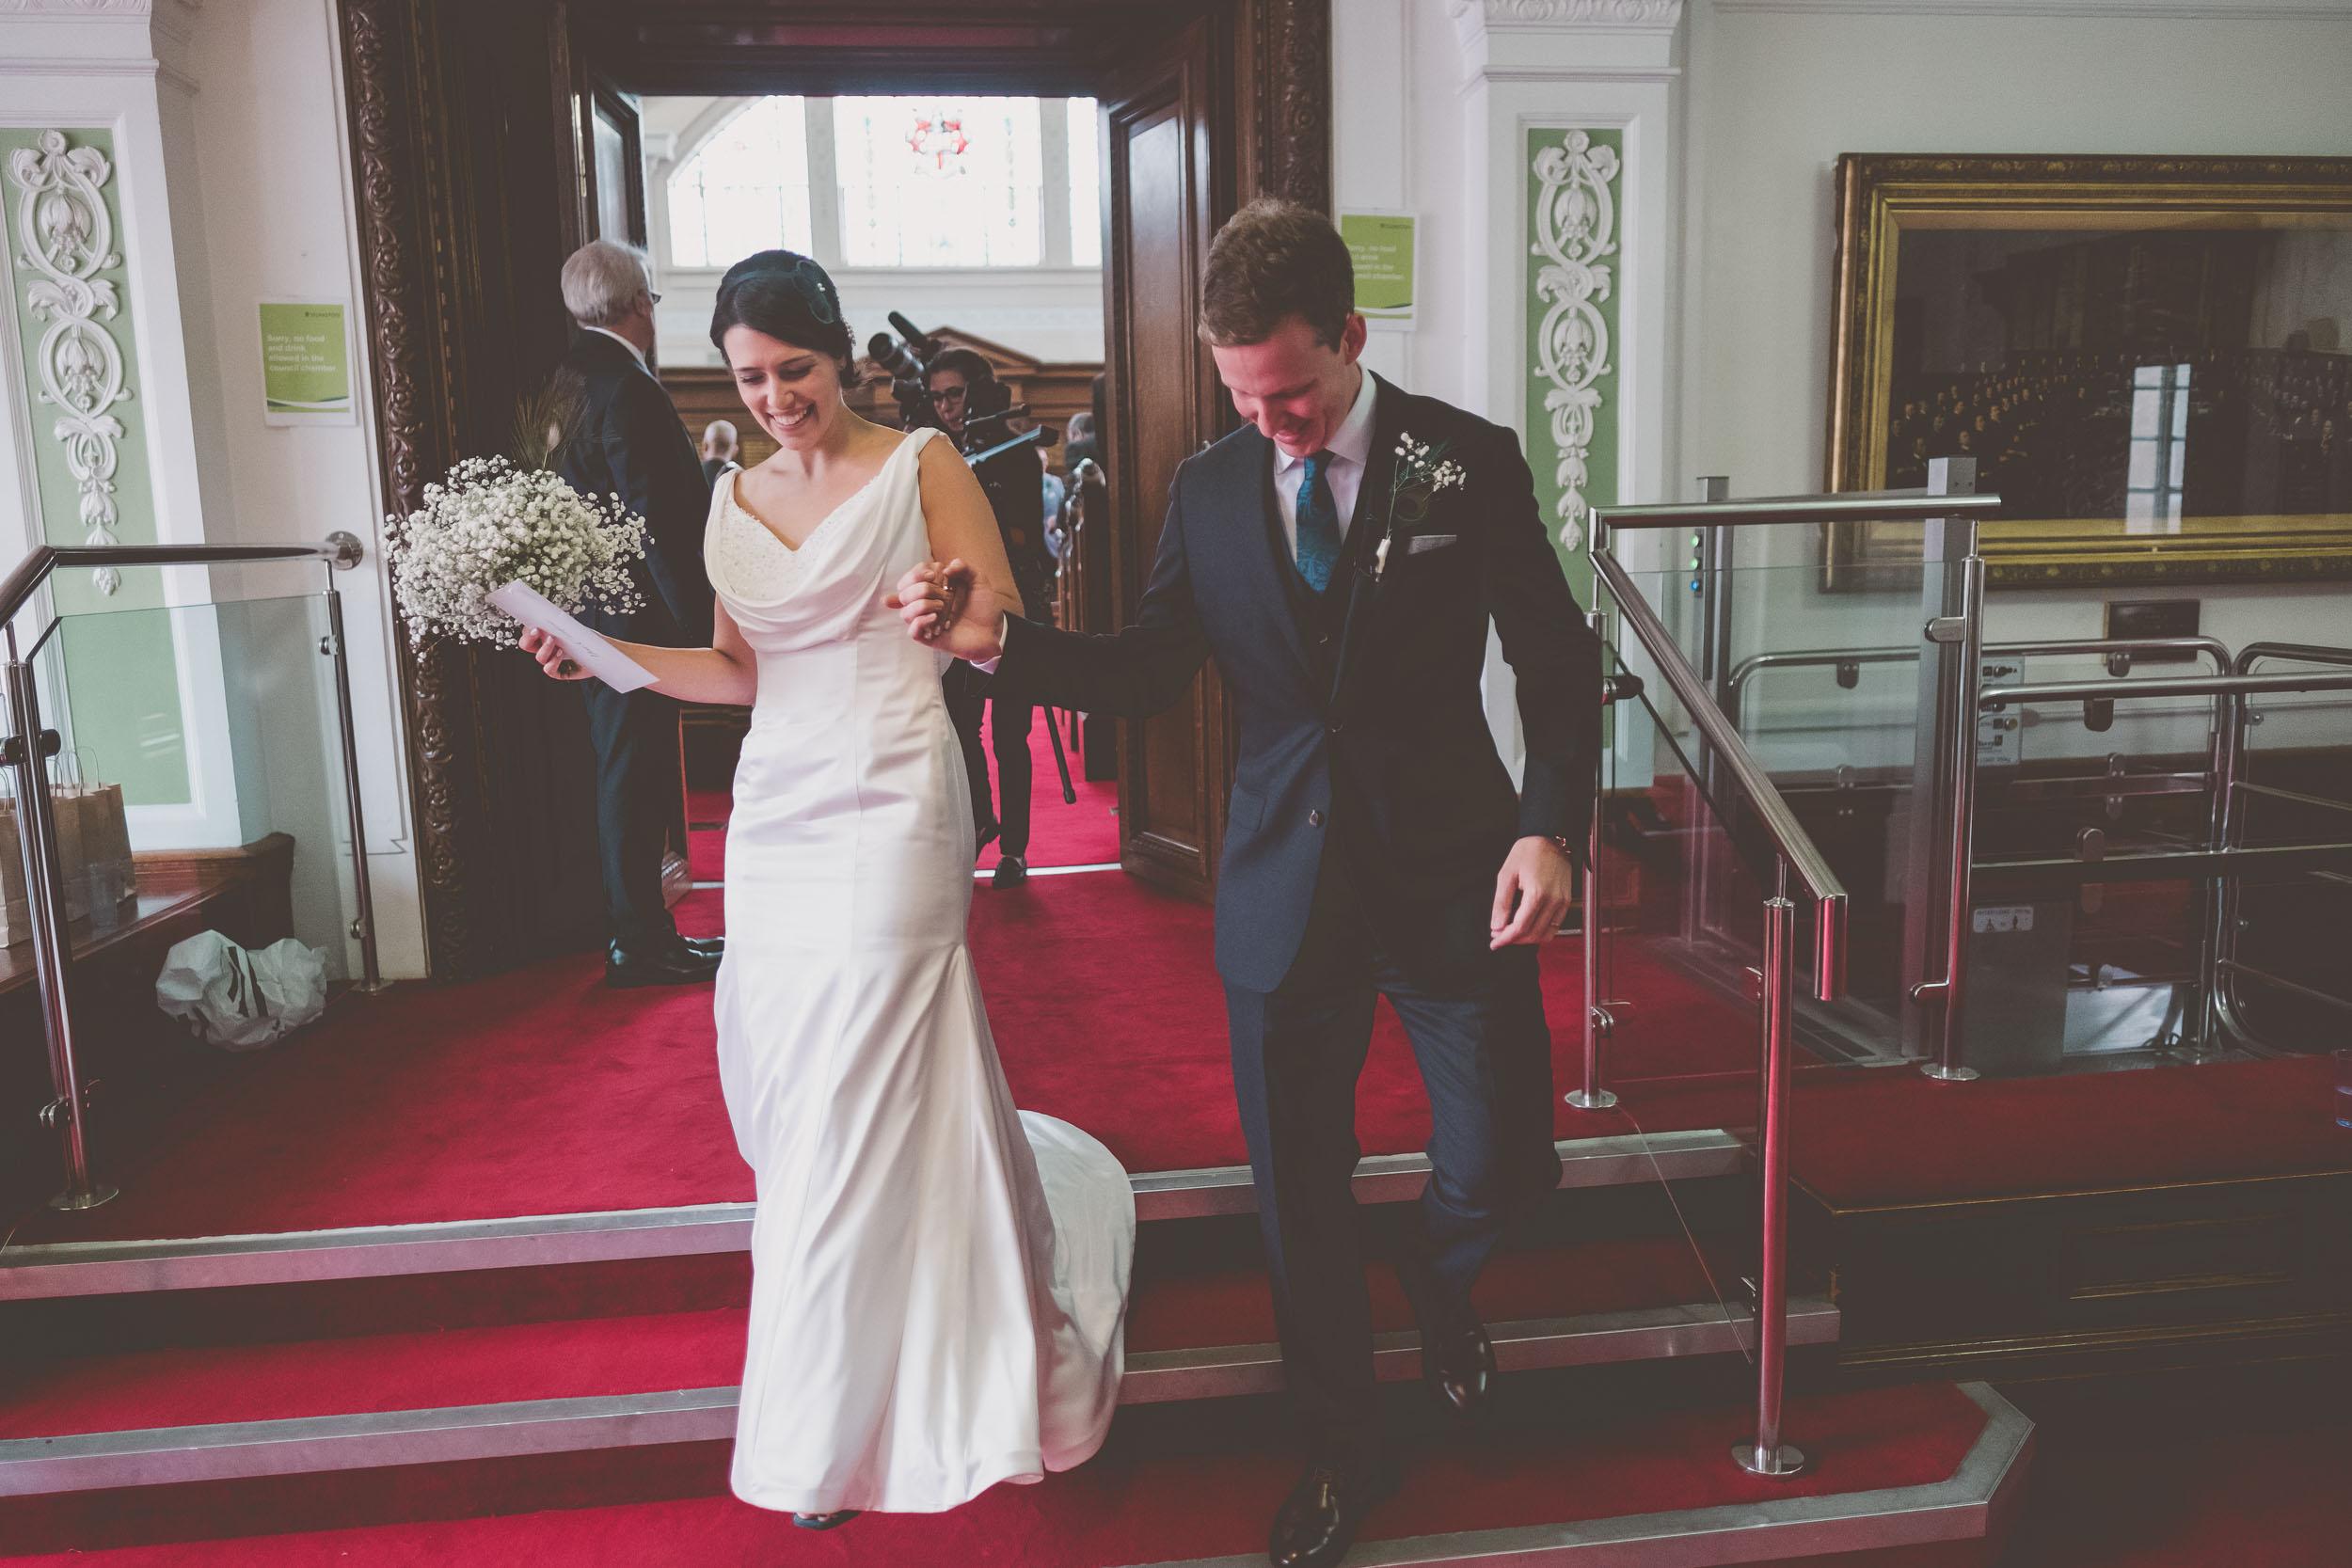 islington-town-hall-4th-floor-studios-wedding128.jpg